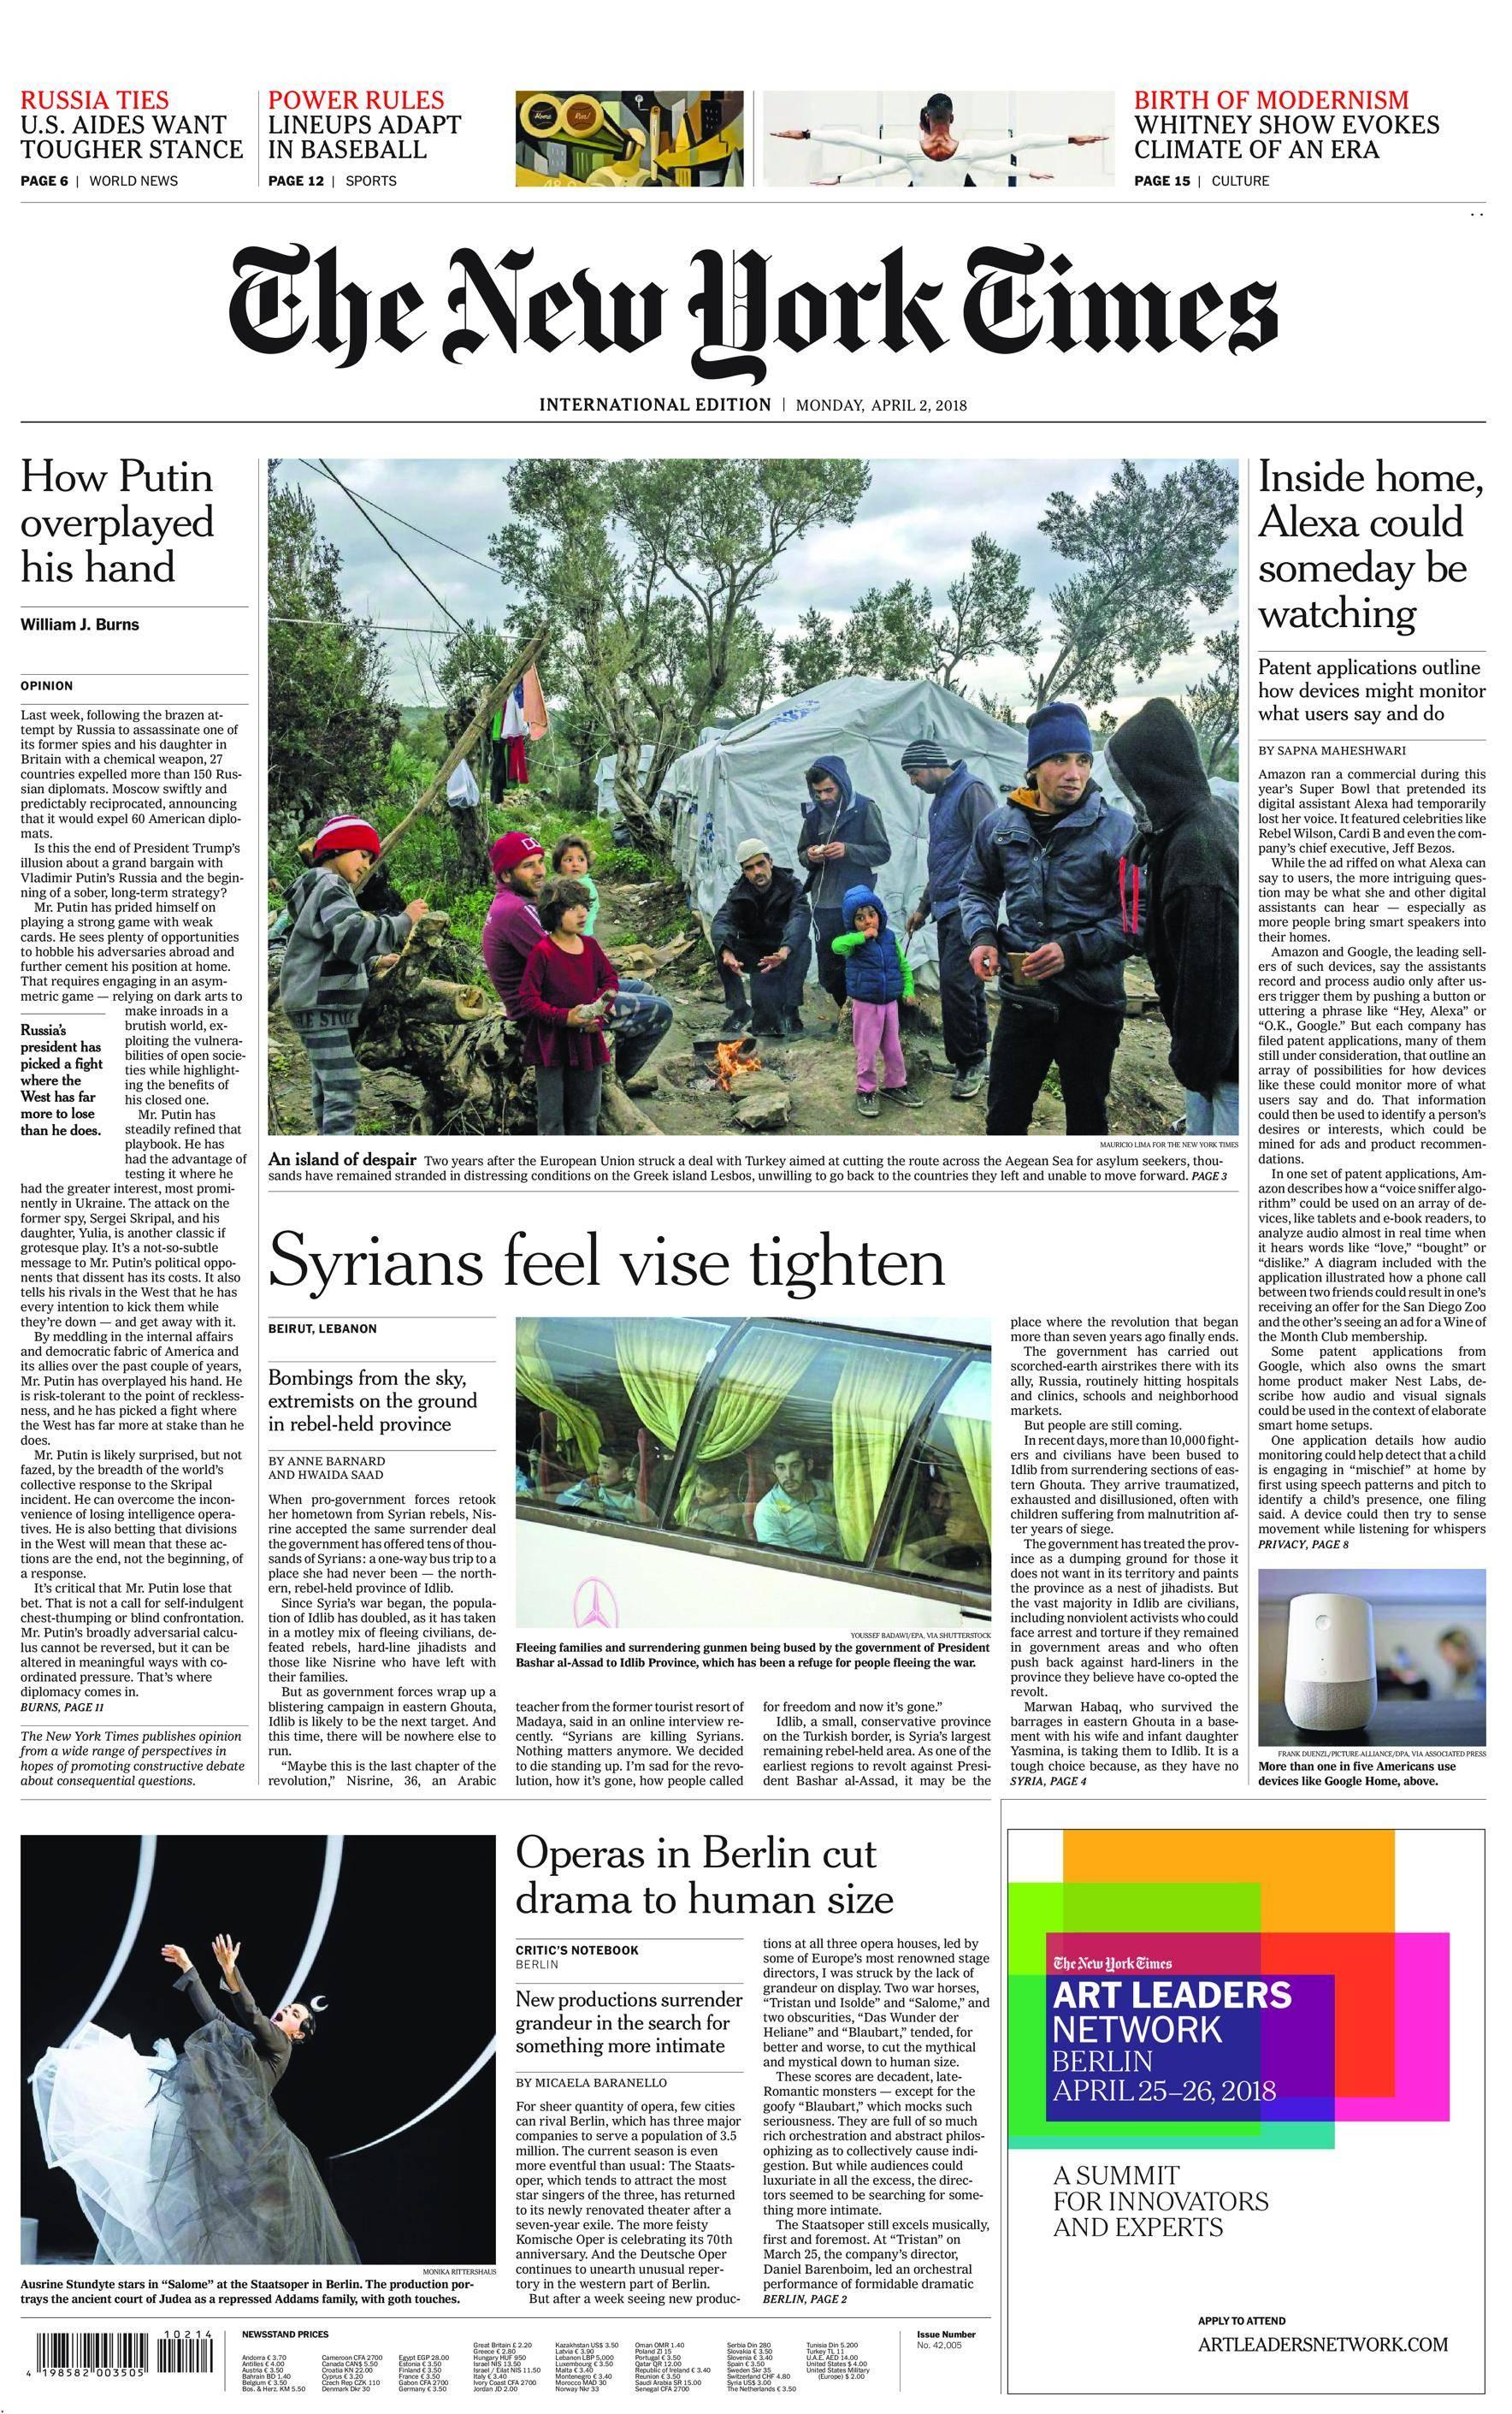 International New York Times - 02 April 2018